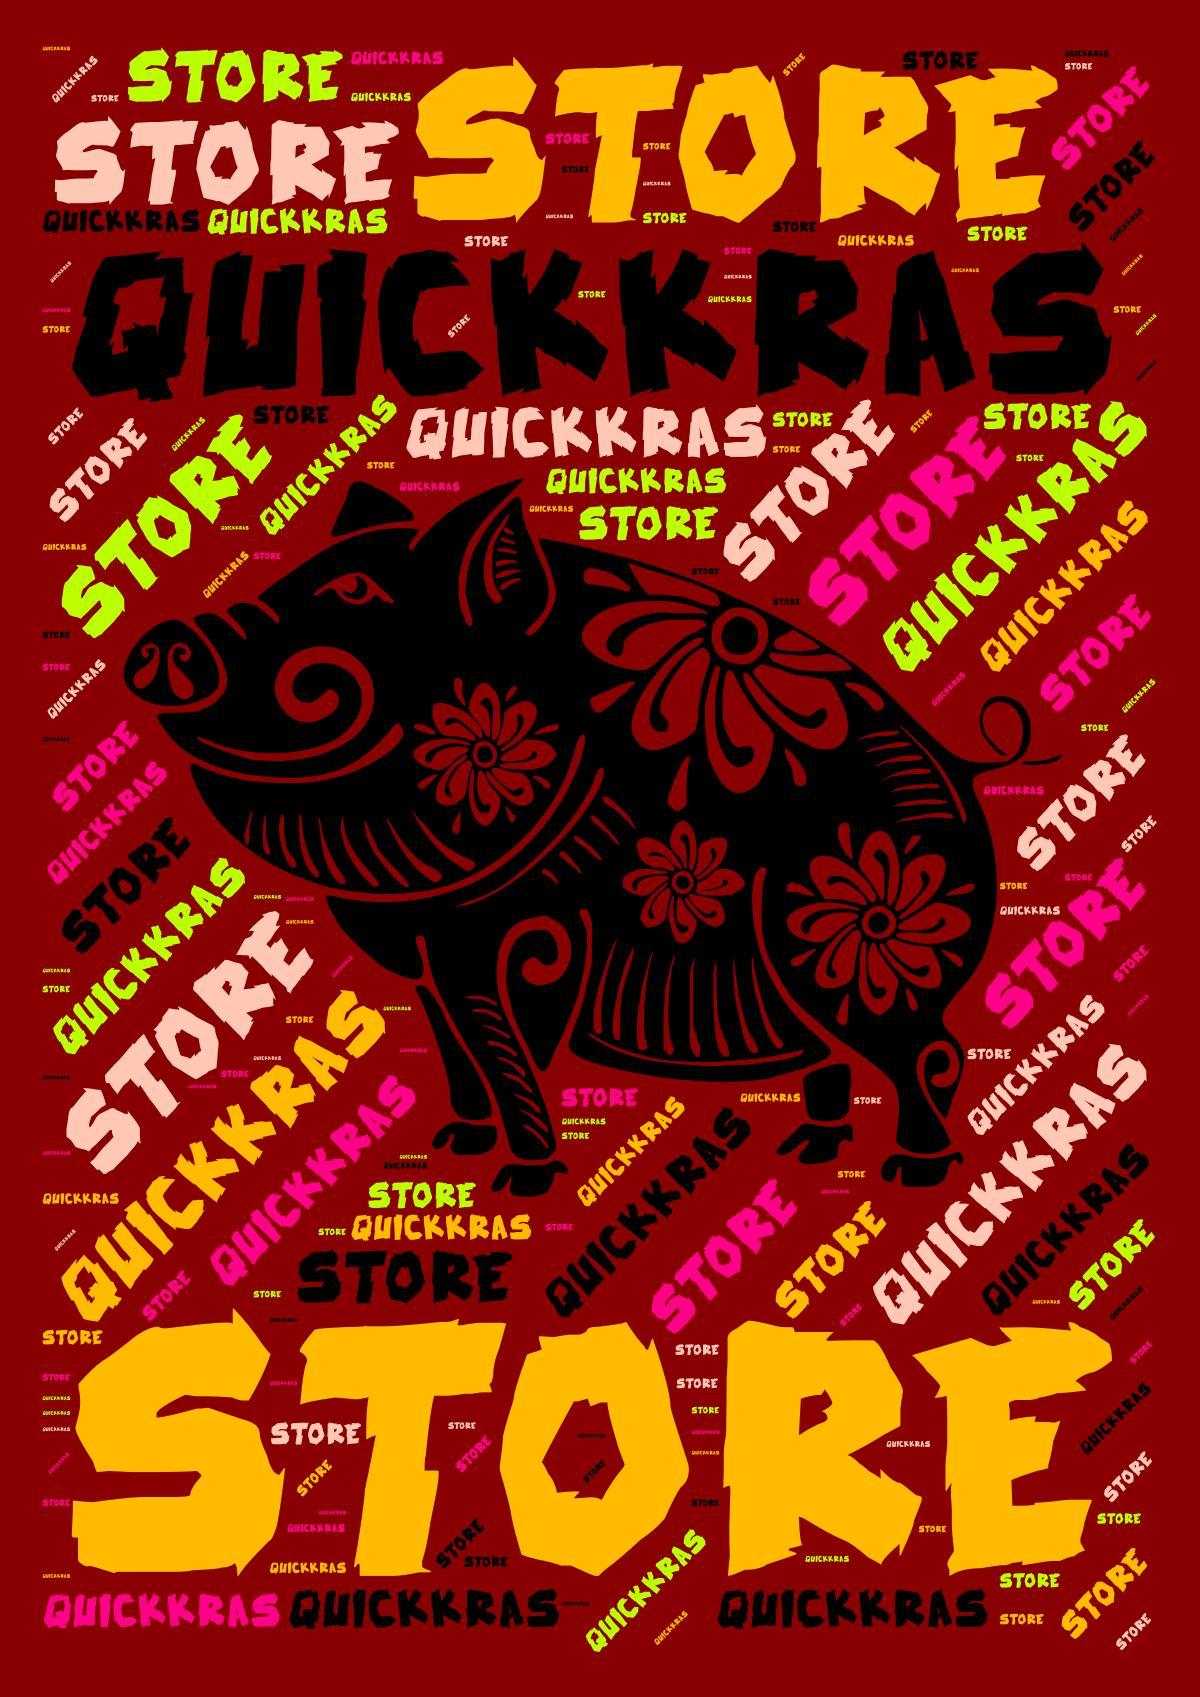 Quickkras Store